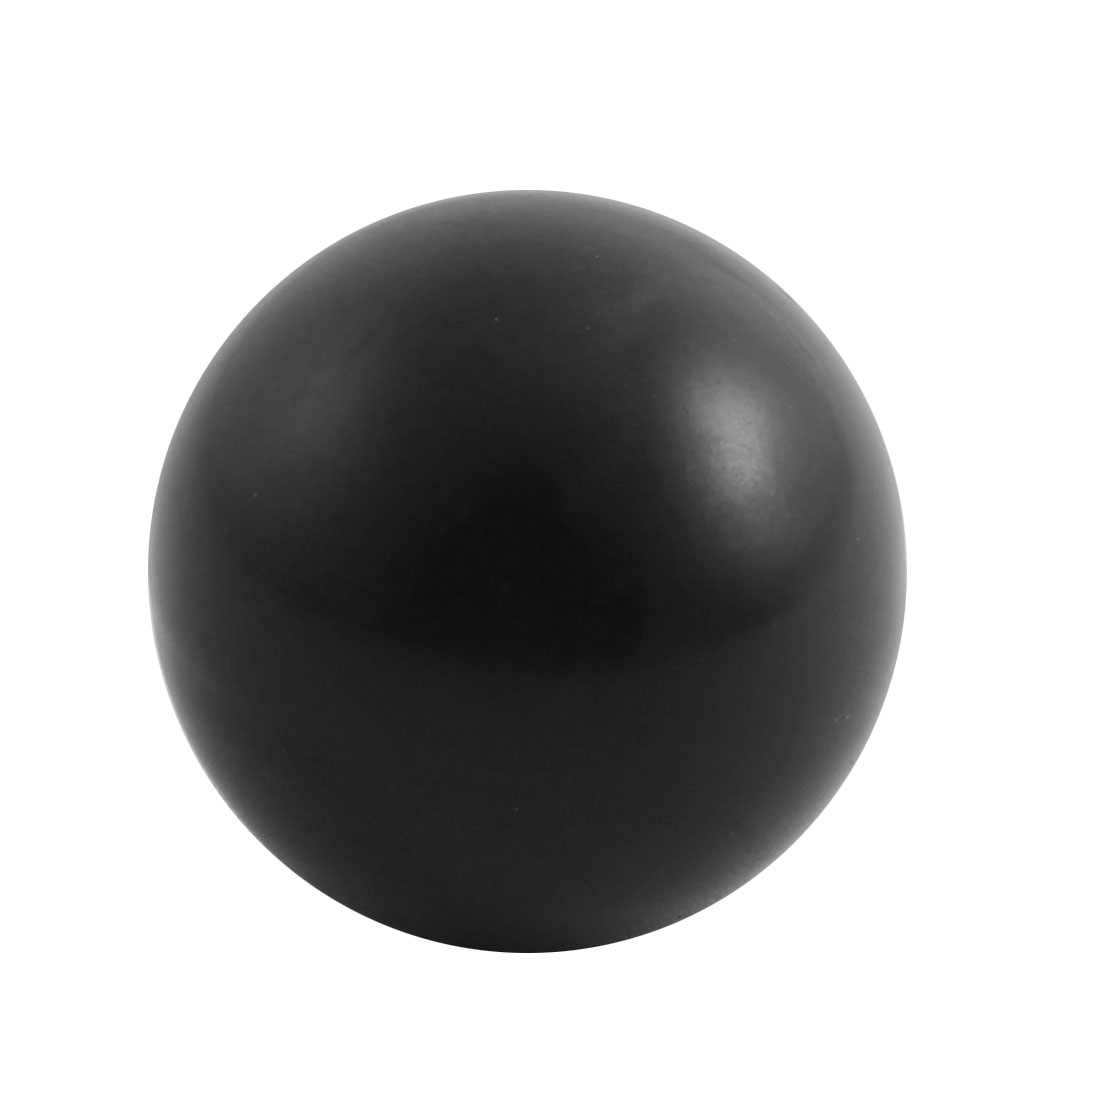 Plastic Ball Shape Joystick Machine Control Knob for Lathe Tractor Black